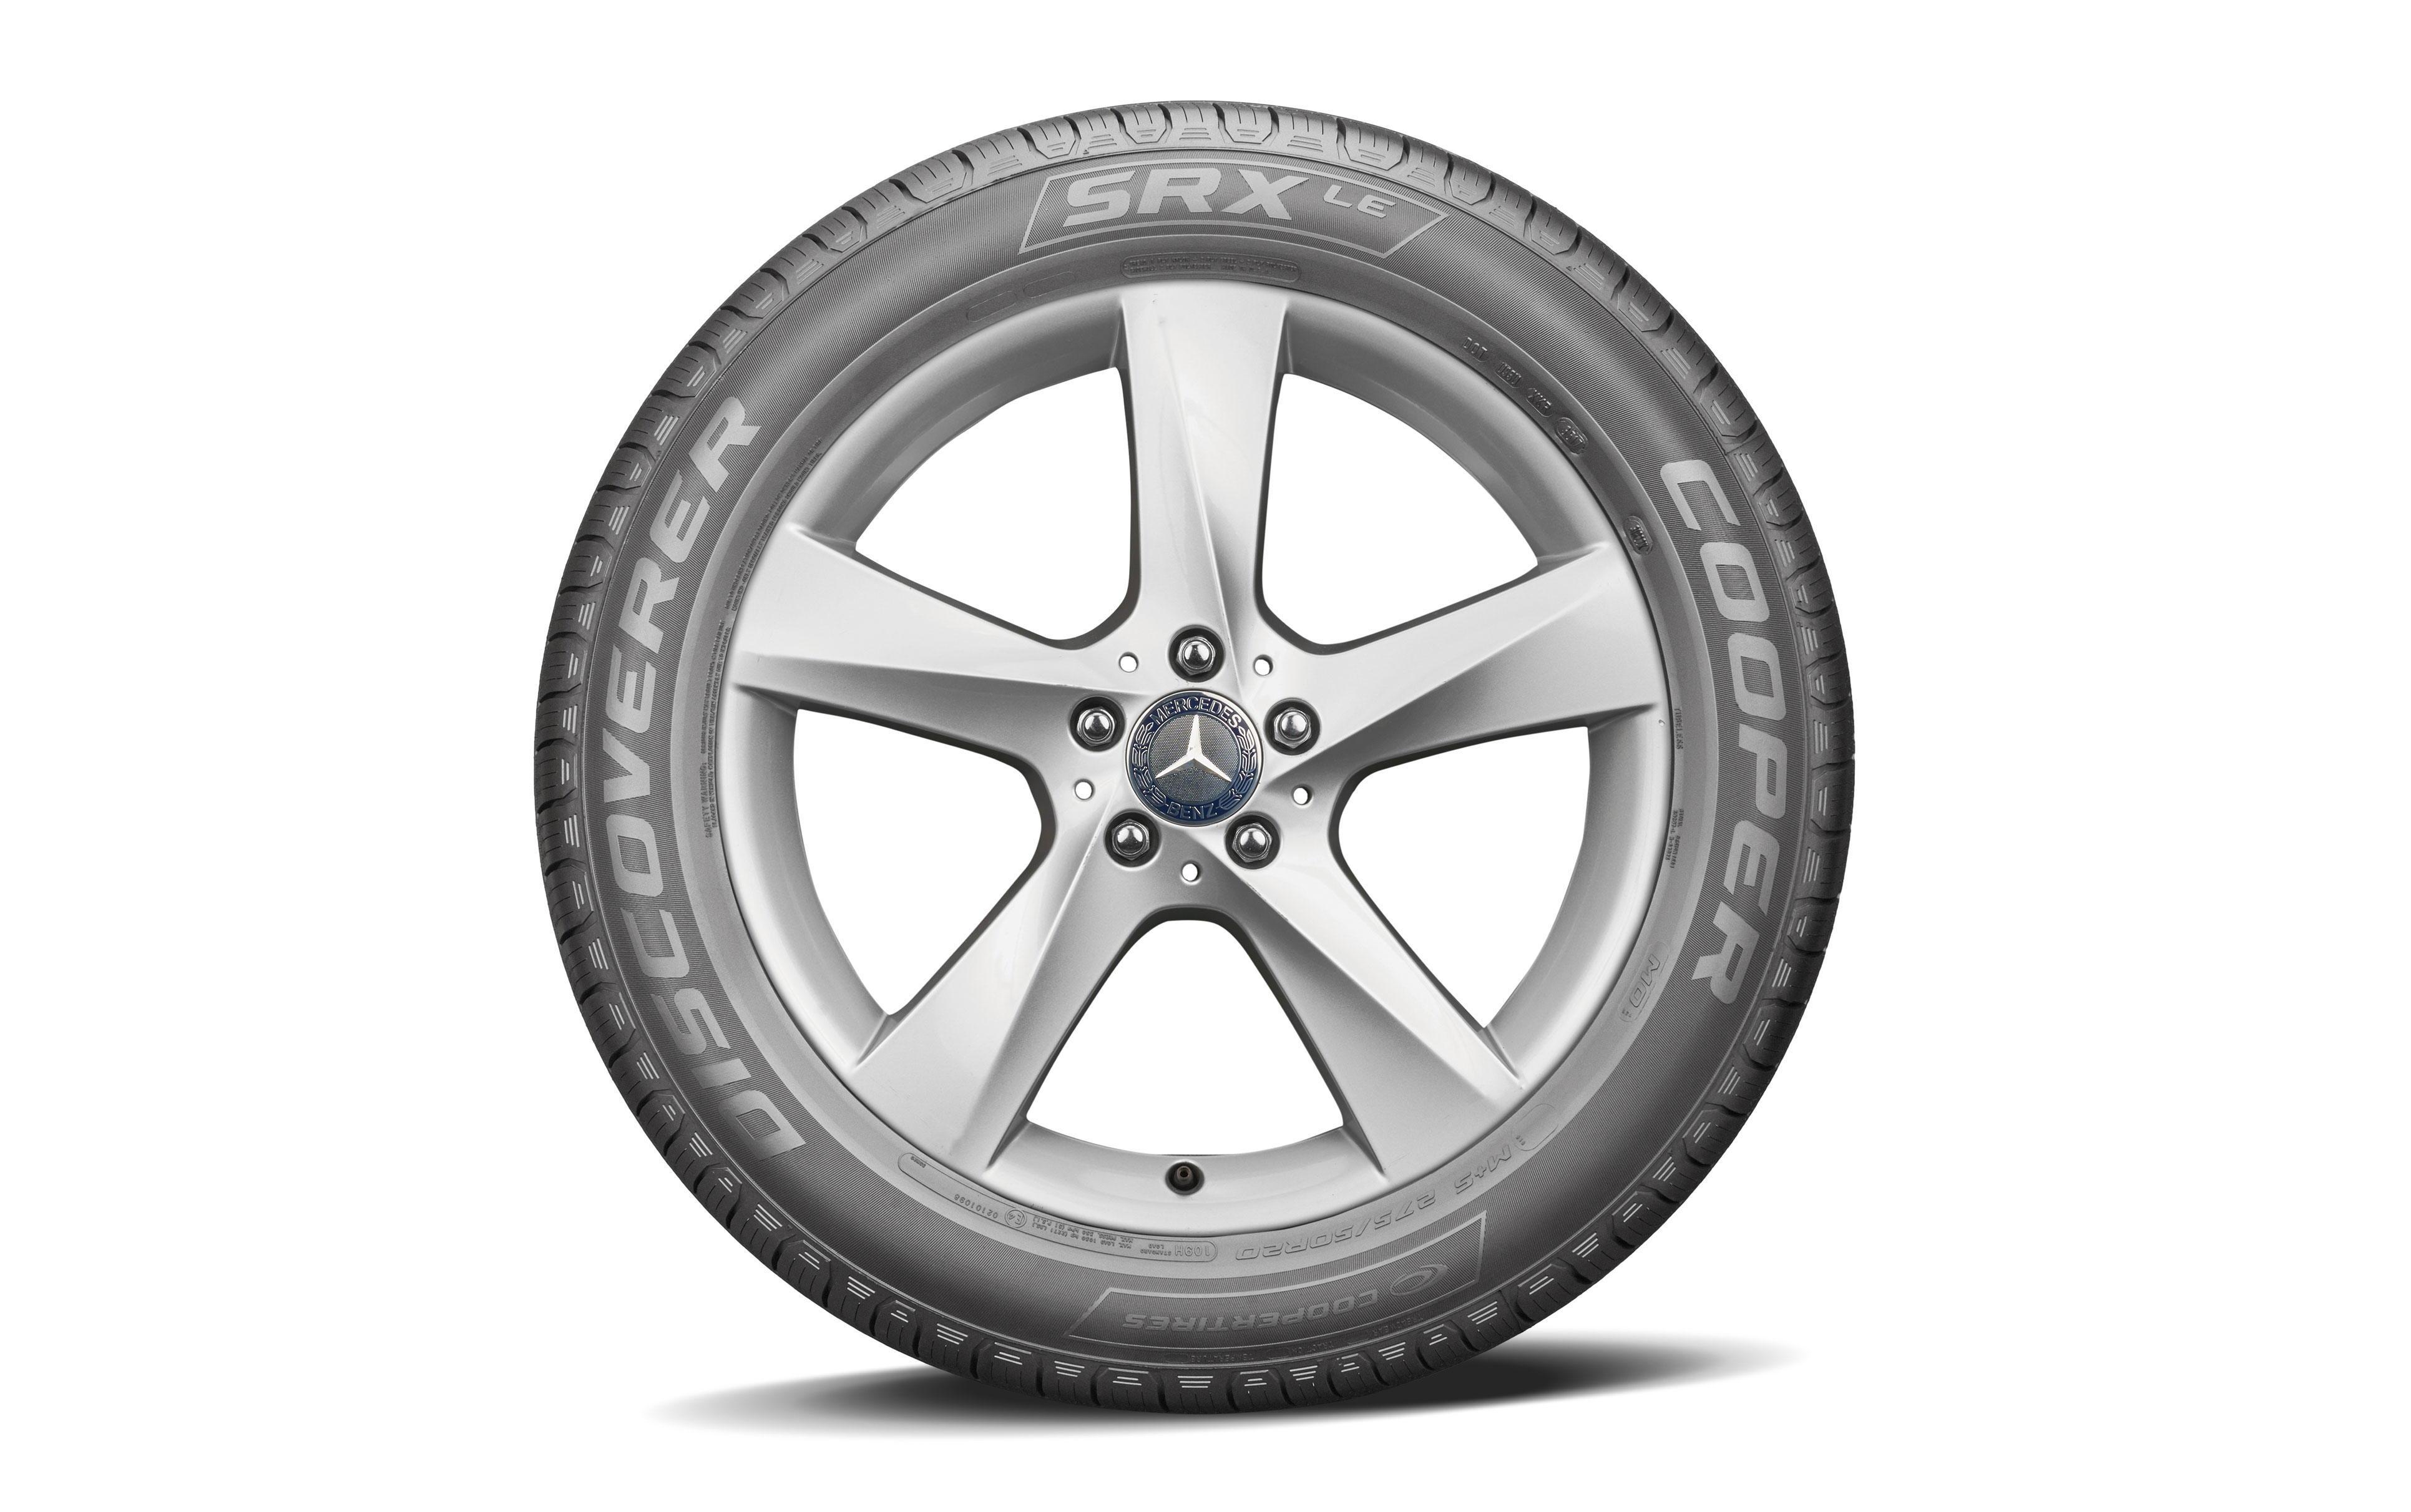 Cooper Discoverer SRXLE™ Tire Selected as Original Equipment for New Mercedes-Benz GLS SUV